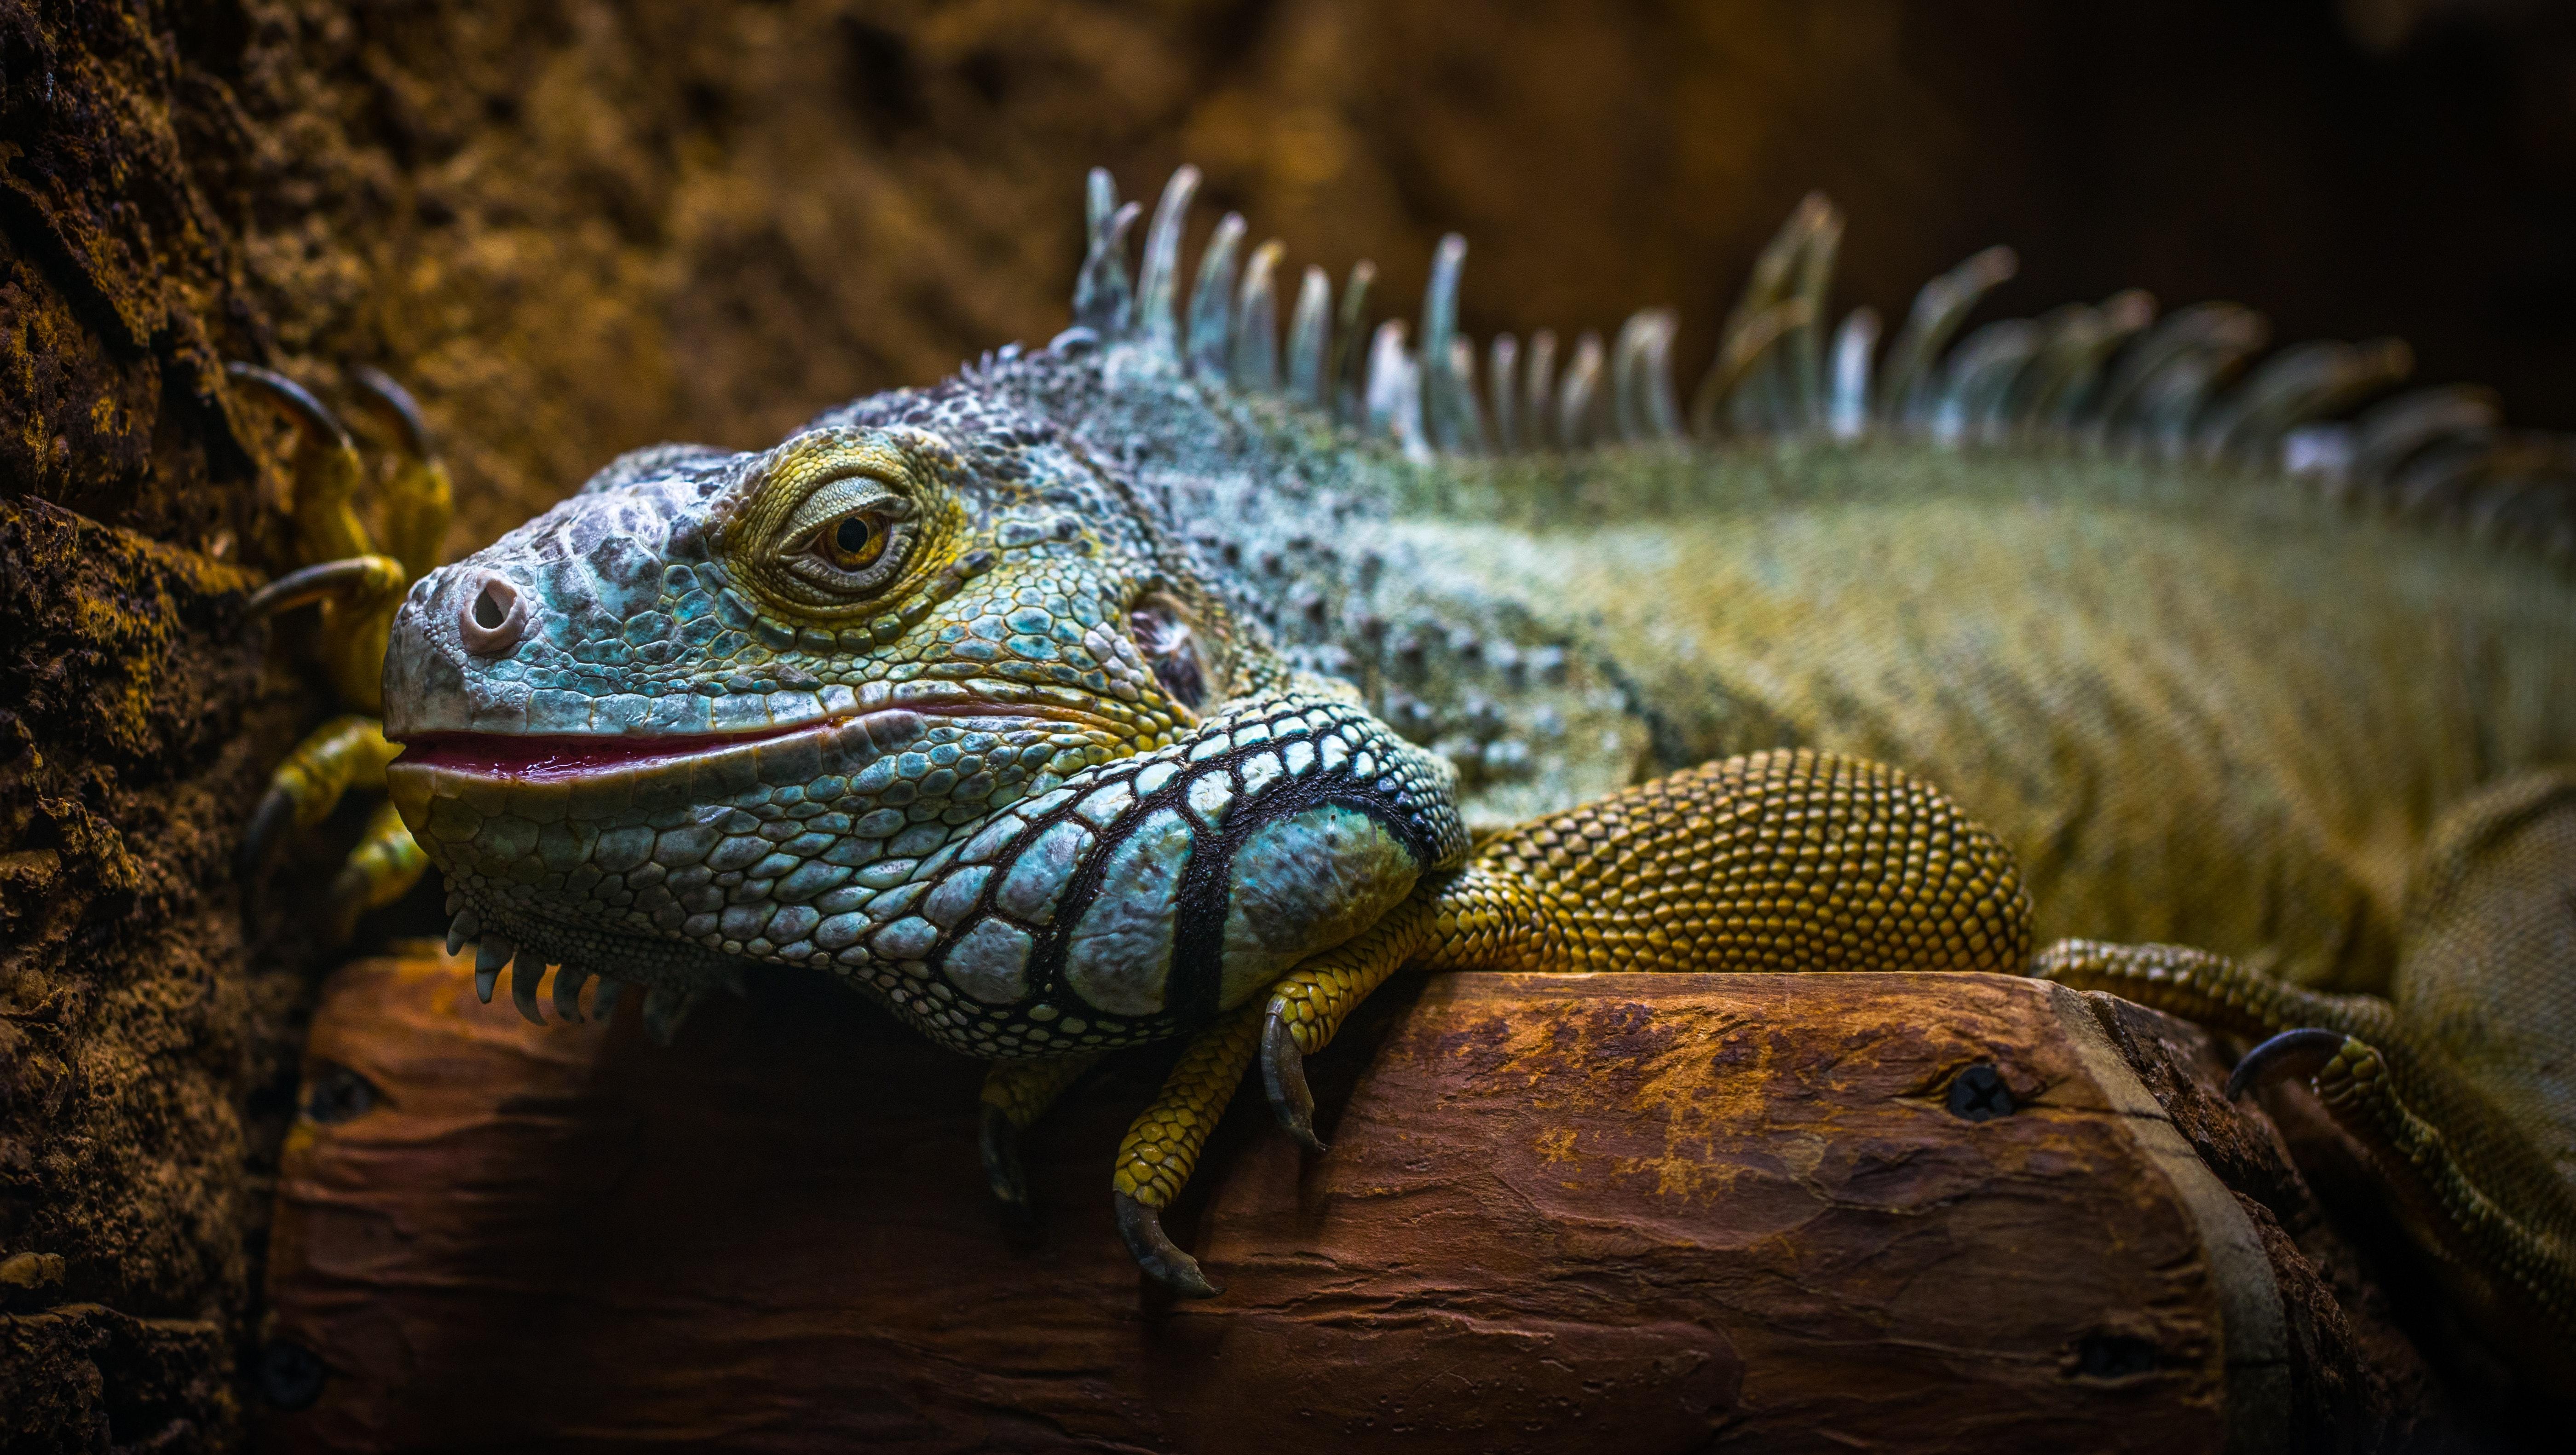 Blue and Brown Iguana, Animal, Mouth, Wild, Vertebrate, HQ Photo